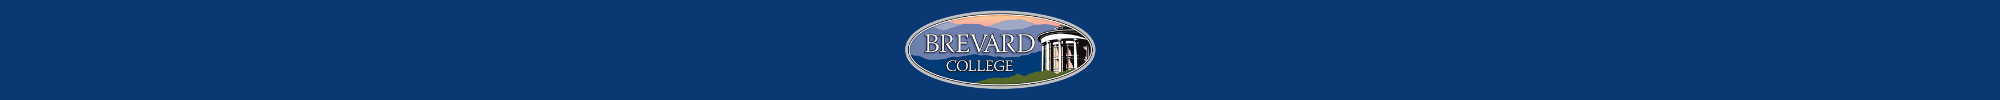 Brevard Logo